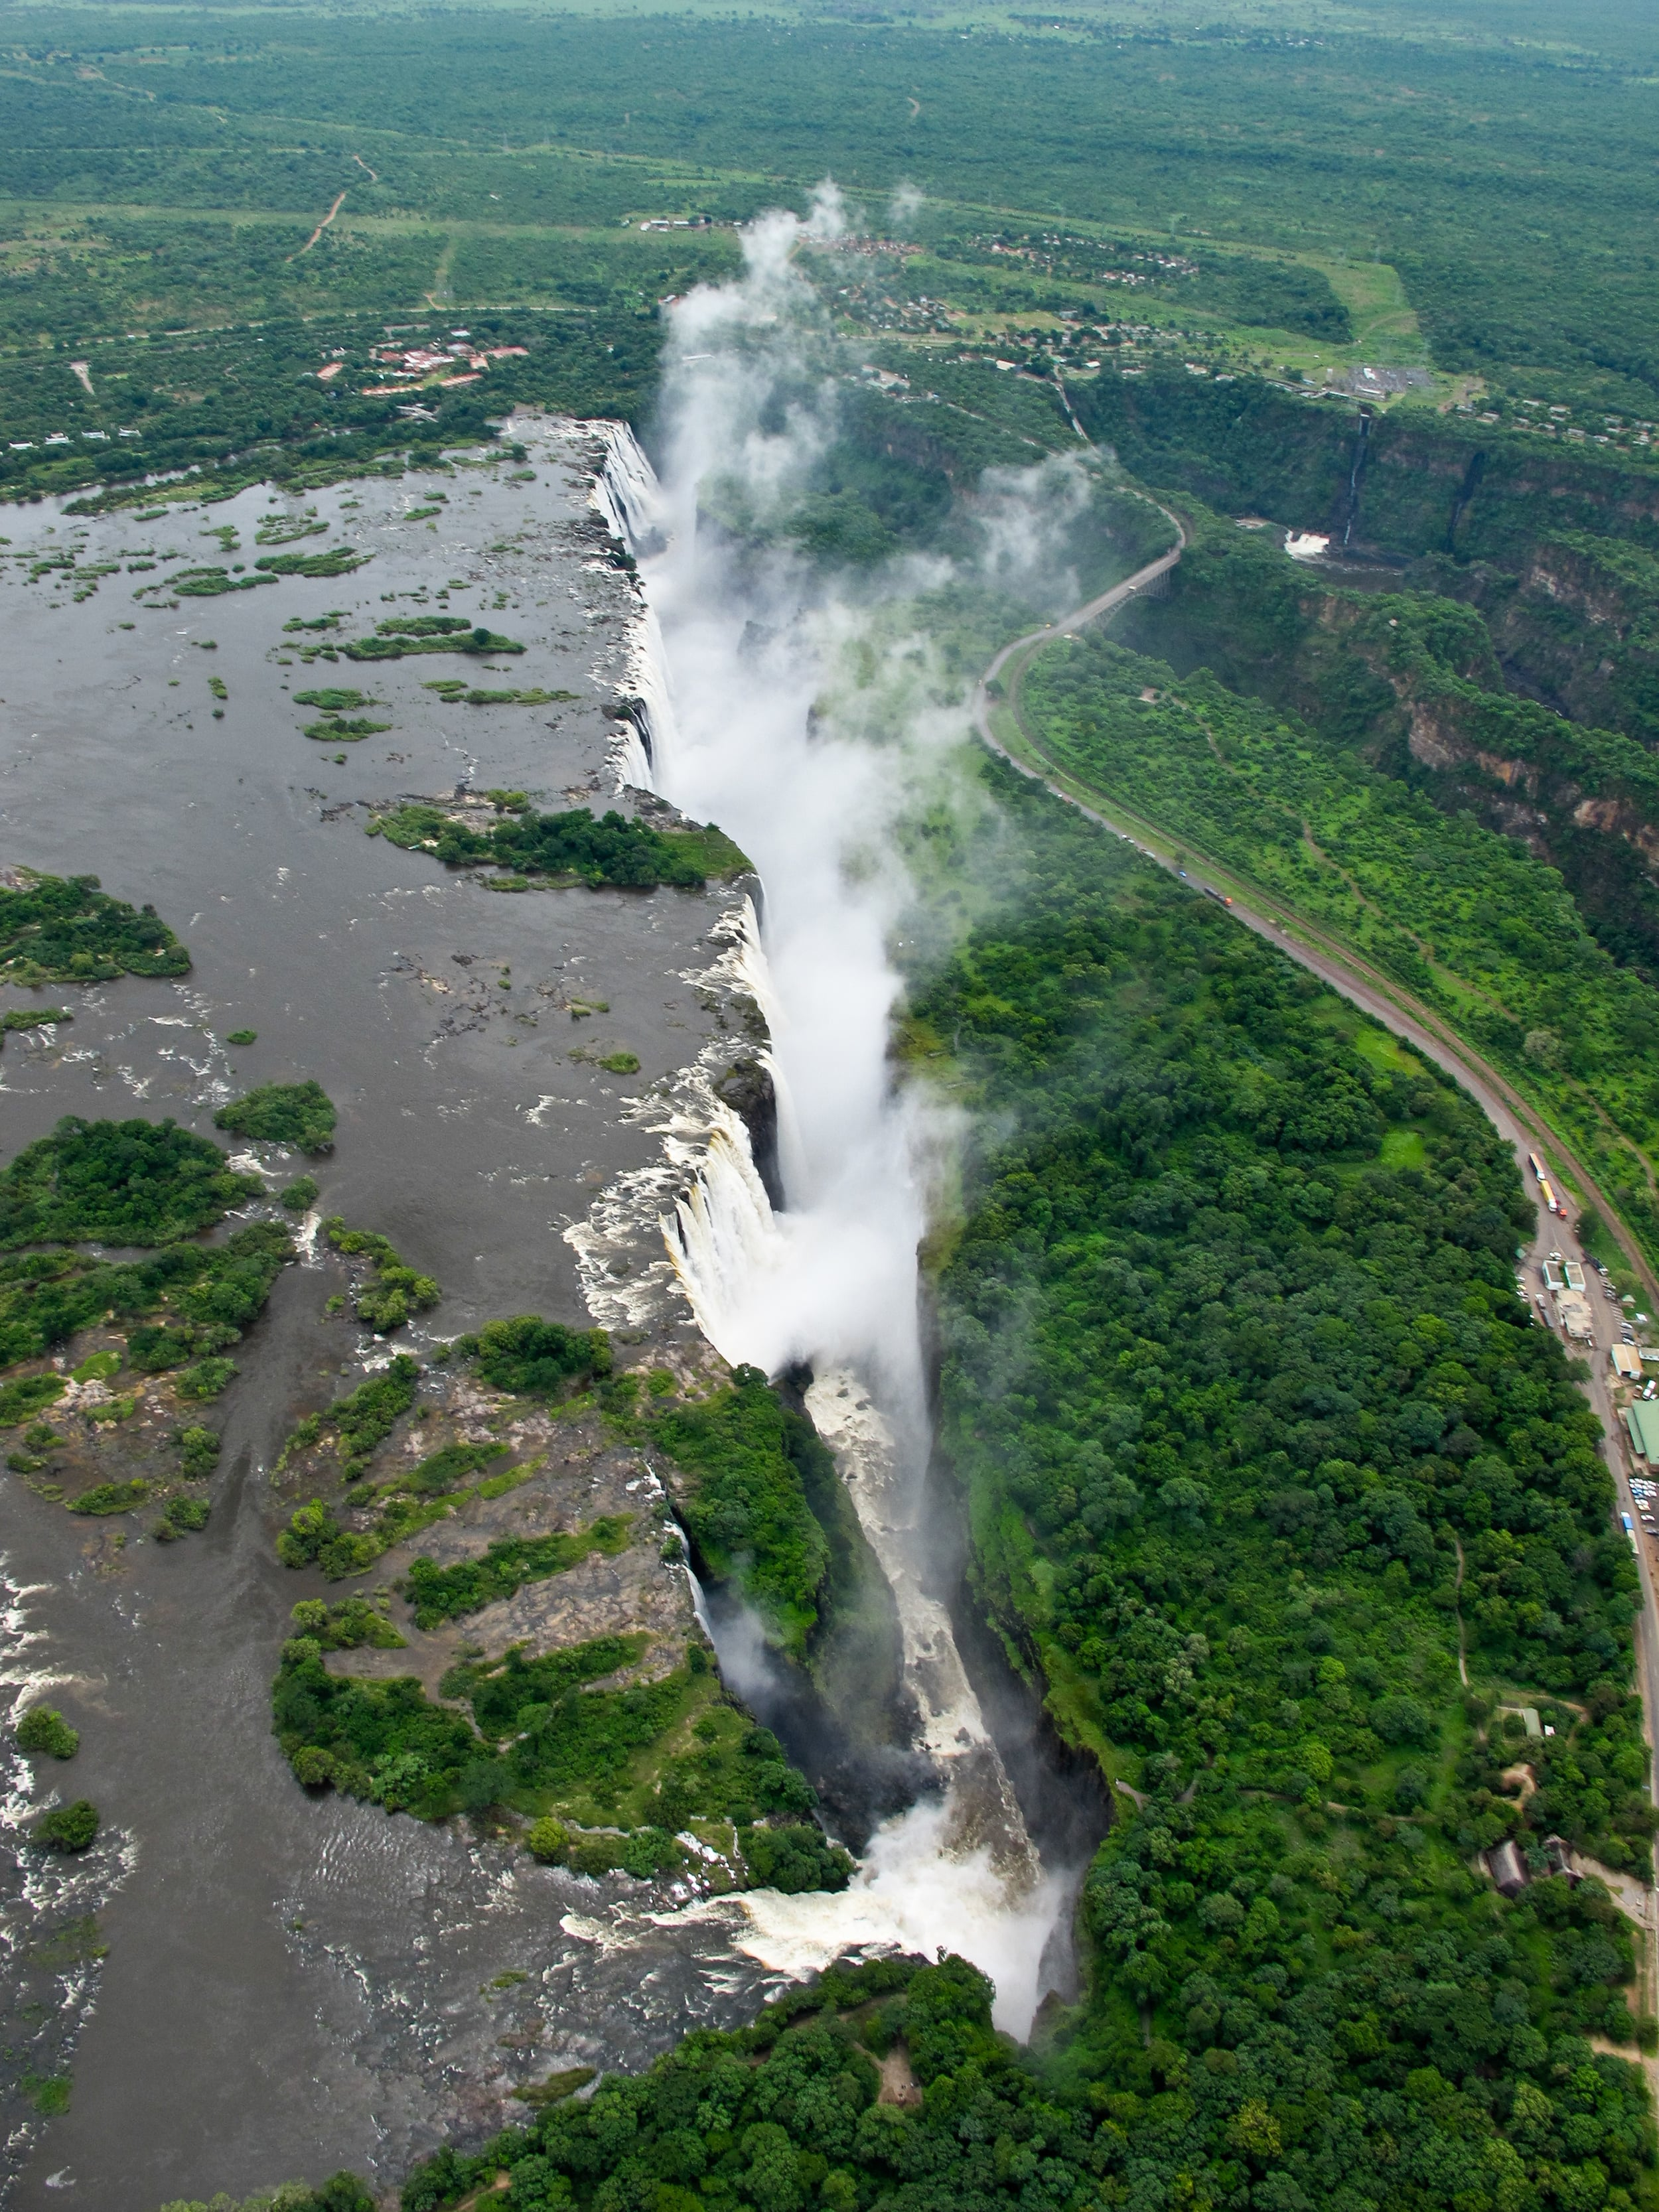 trisa-taro-helicopter-ride-victoria-falls-zimbabwe.jpg